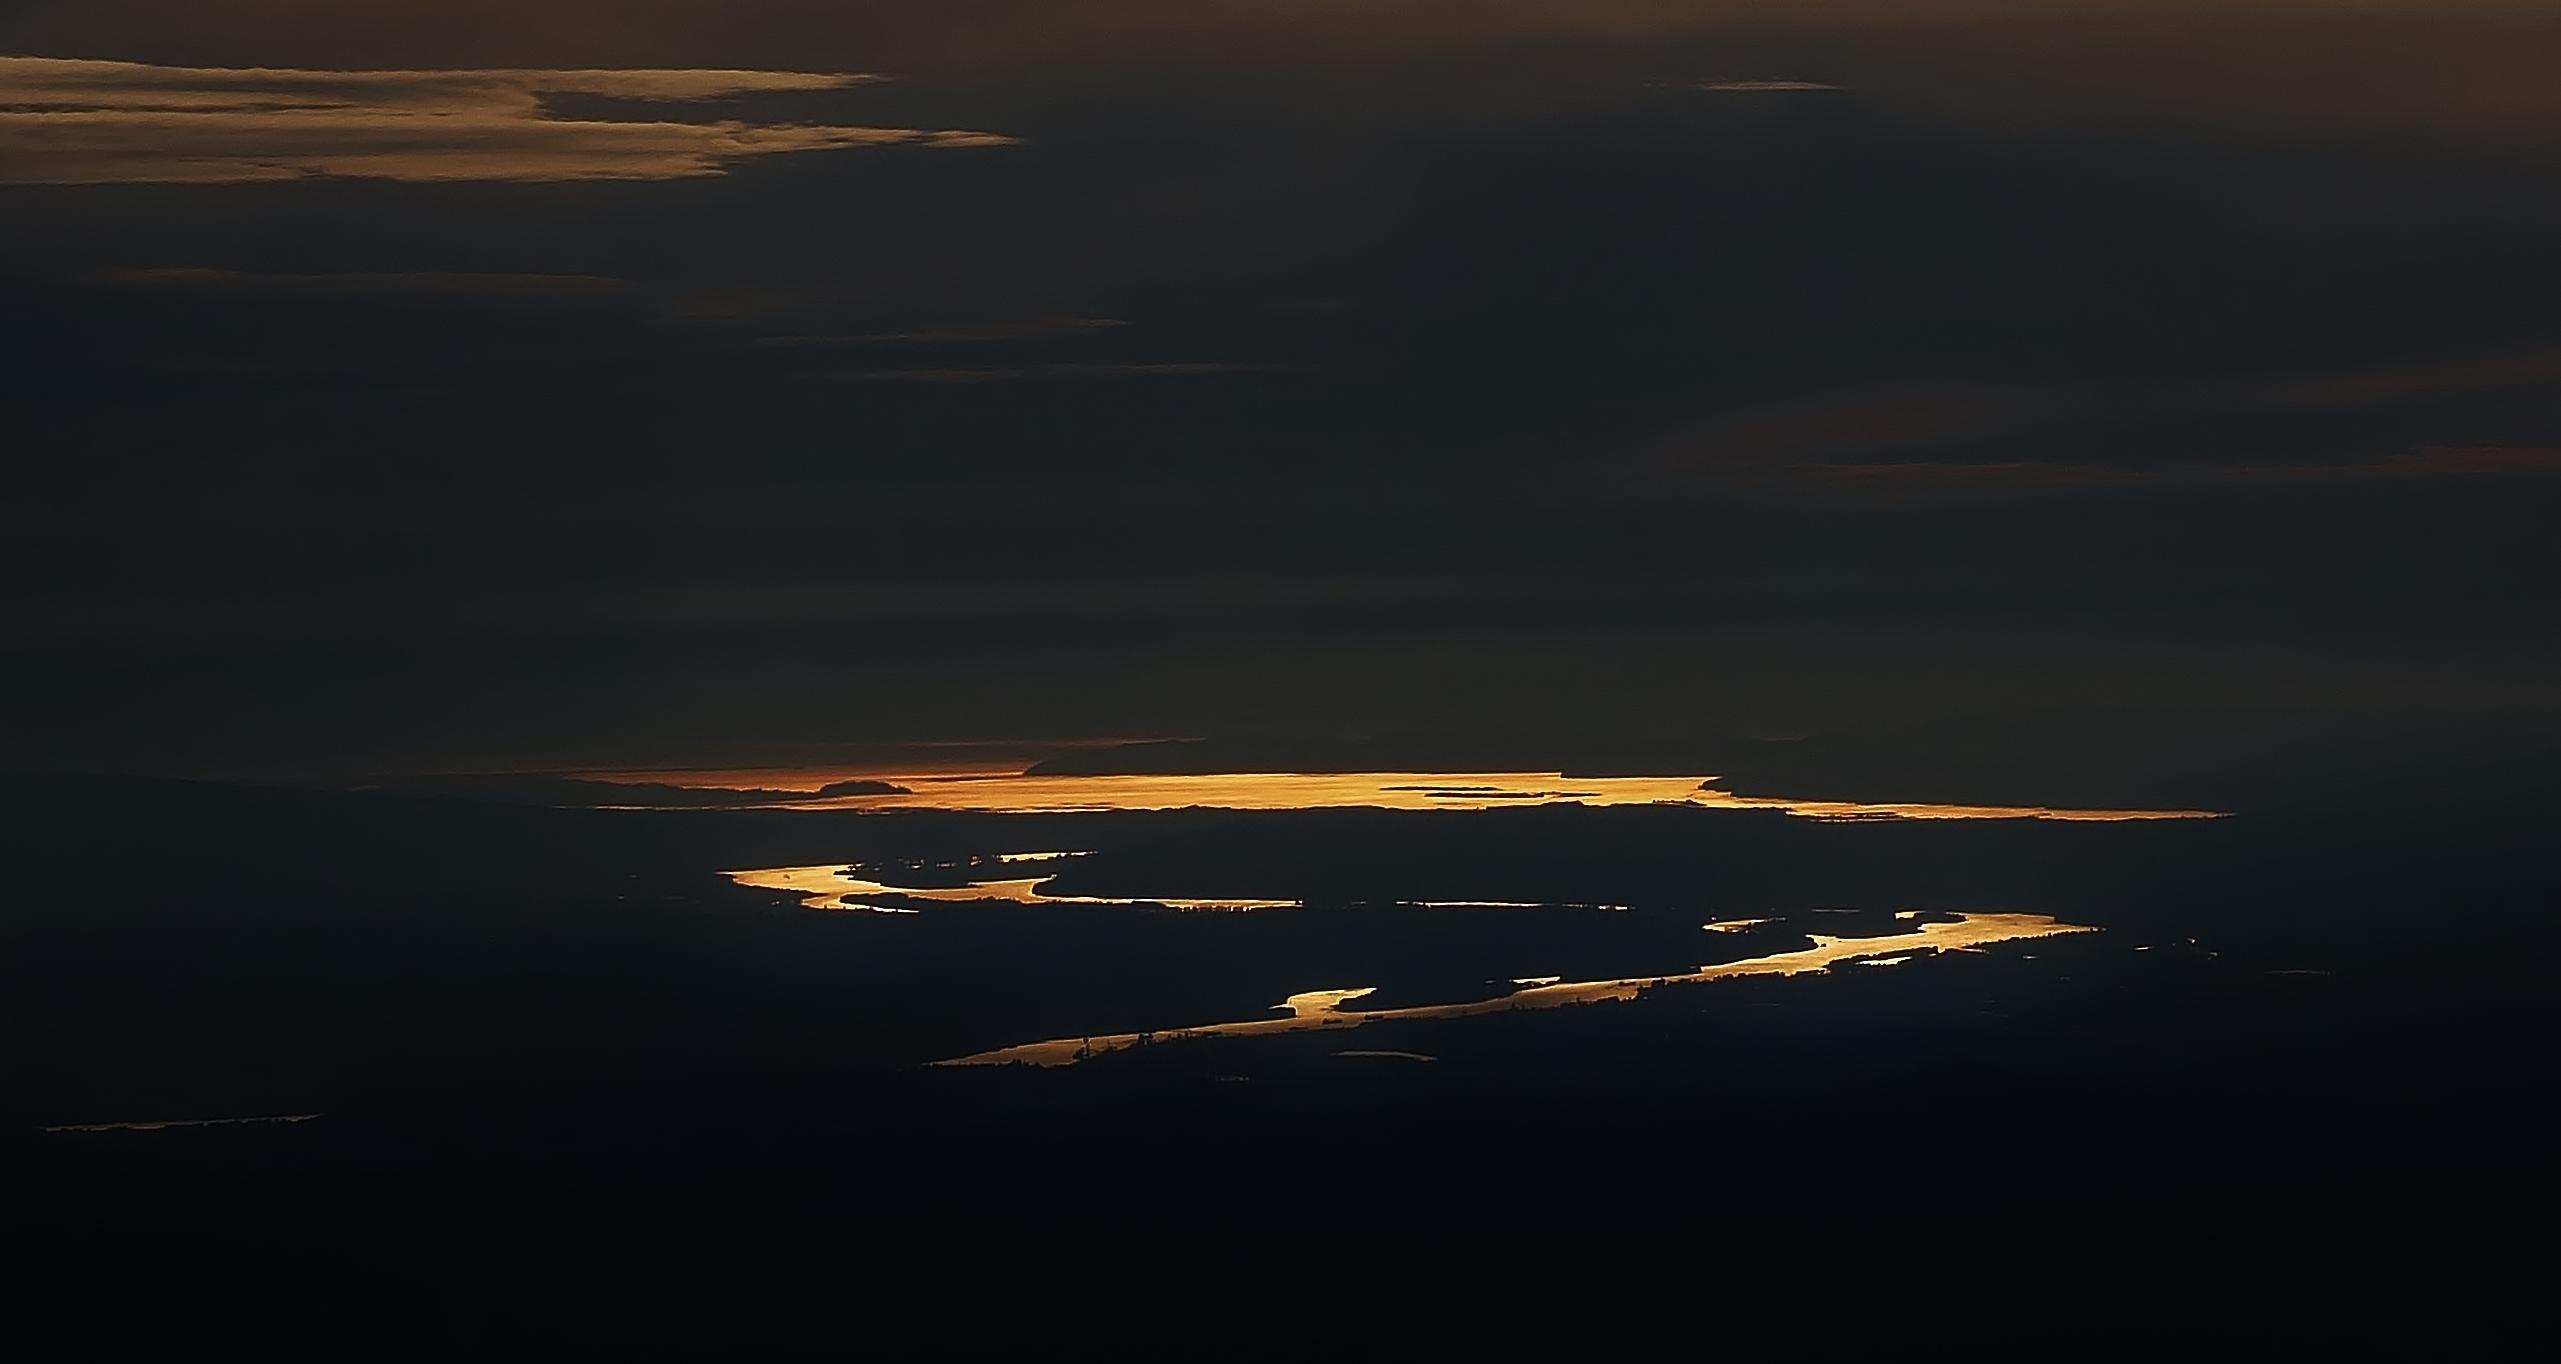 aerialphoto.a.4